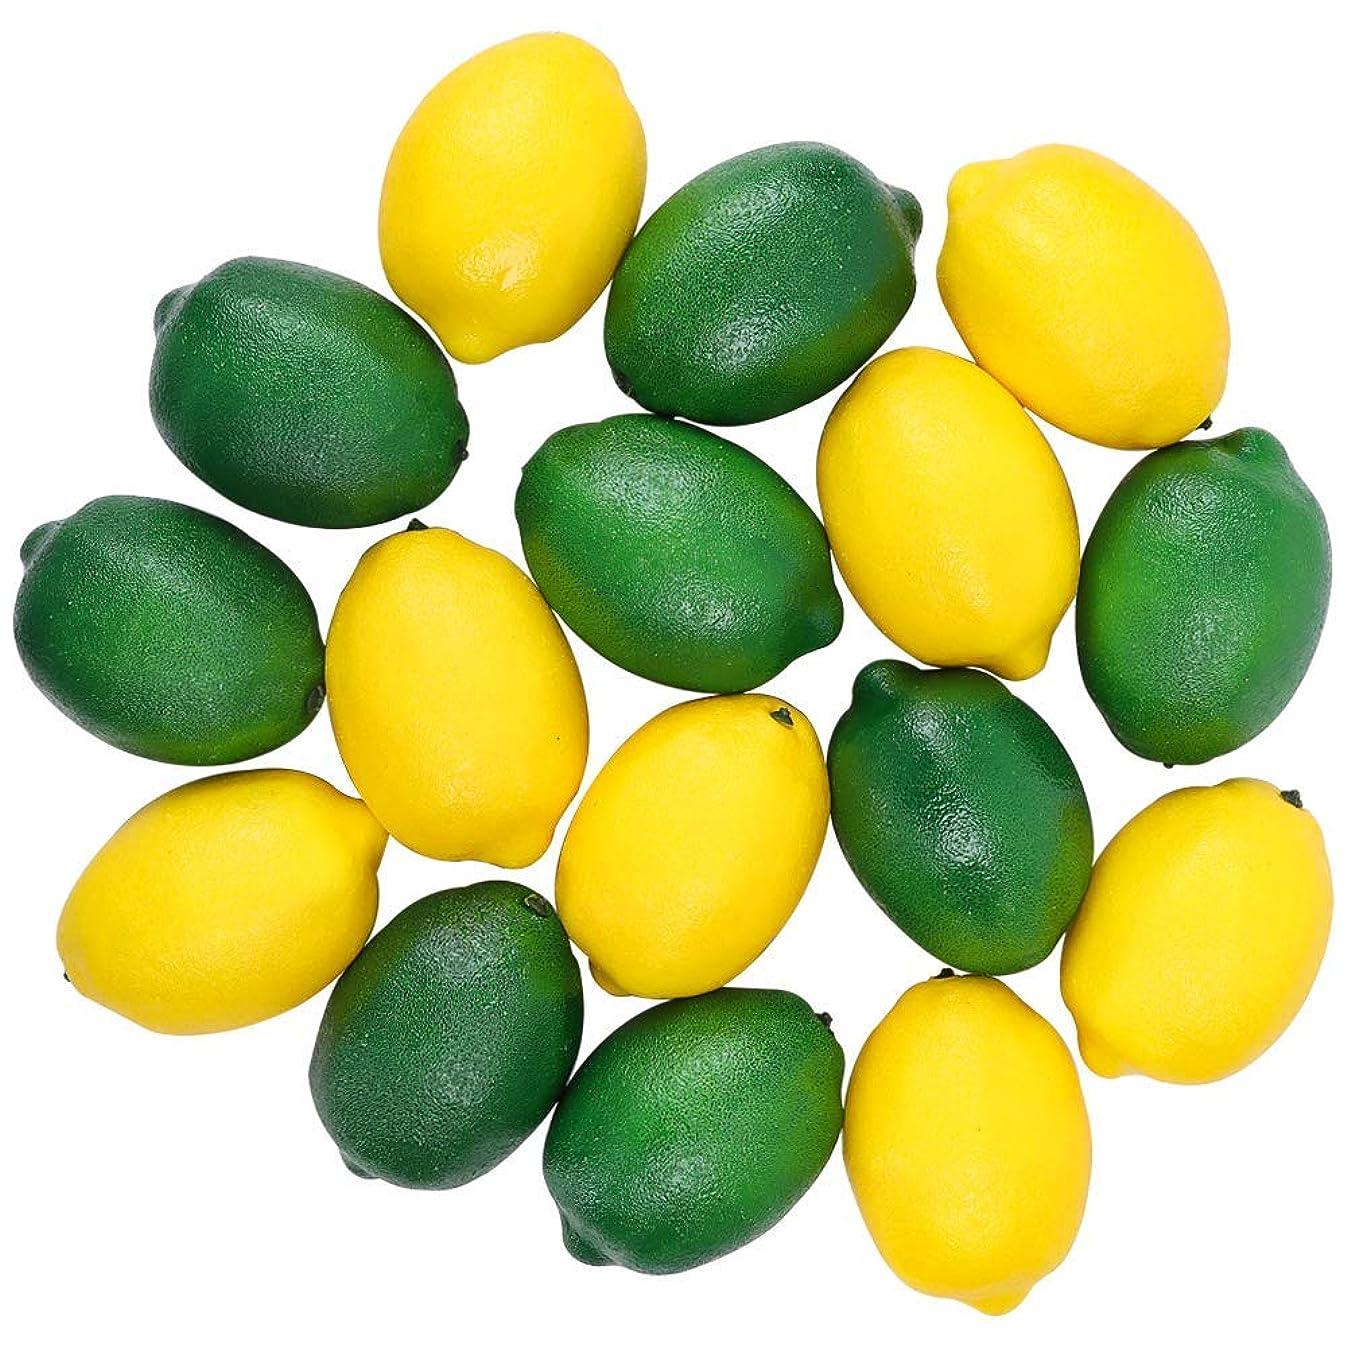 Woooow 12pcs Fake Lemon Artificial Fruits Lifelike Lemons Simulation Lemon Green and Yellow Lemon Mixed Set for Home Fruit Shop Supermarket Desk Office Or Props